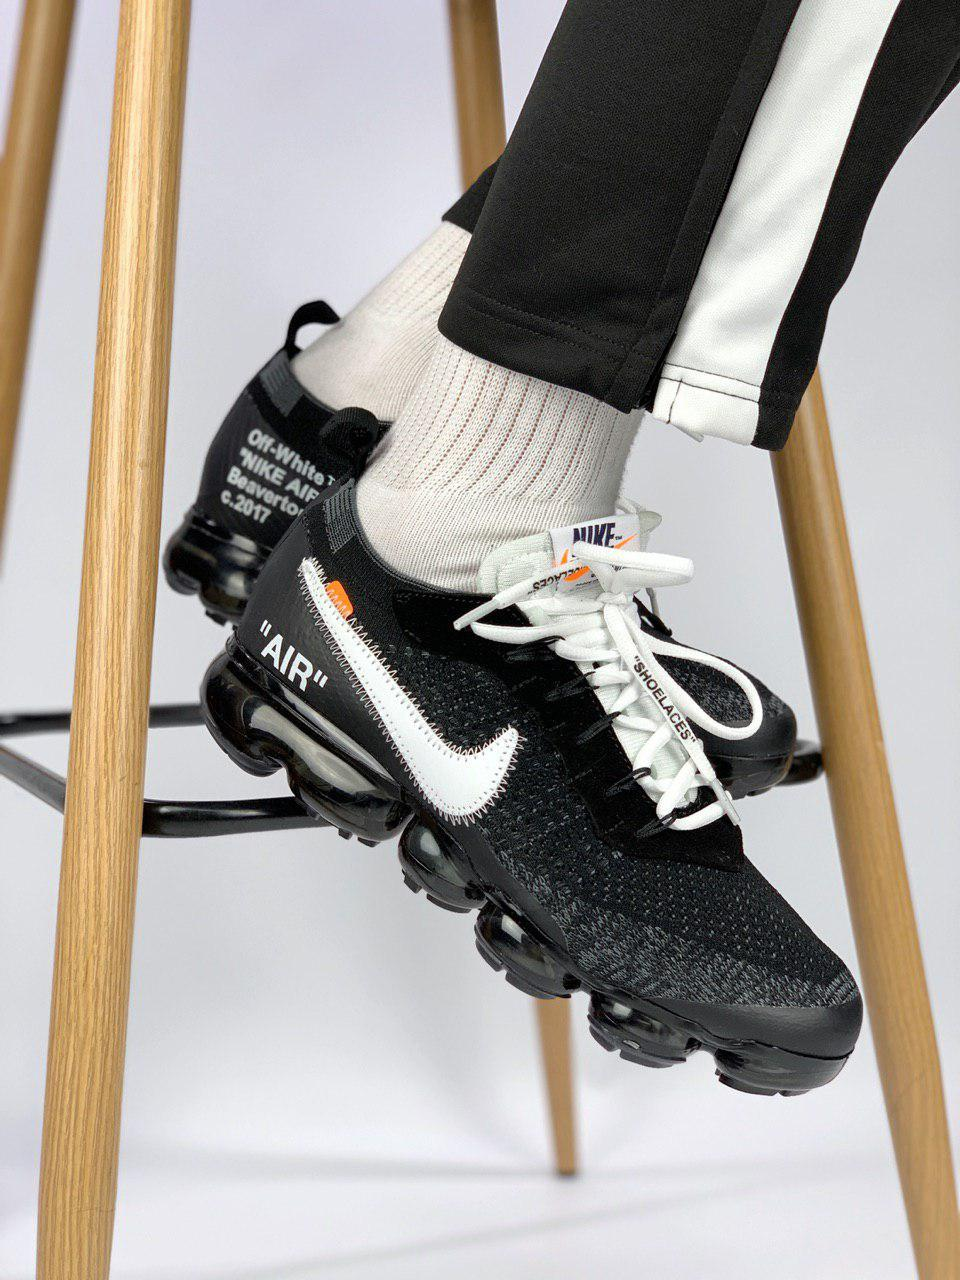 Мужские кроссовки в стиле Off White x Nike VaporMax (40, 41, 42, 43, 44, 45 размеры)